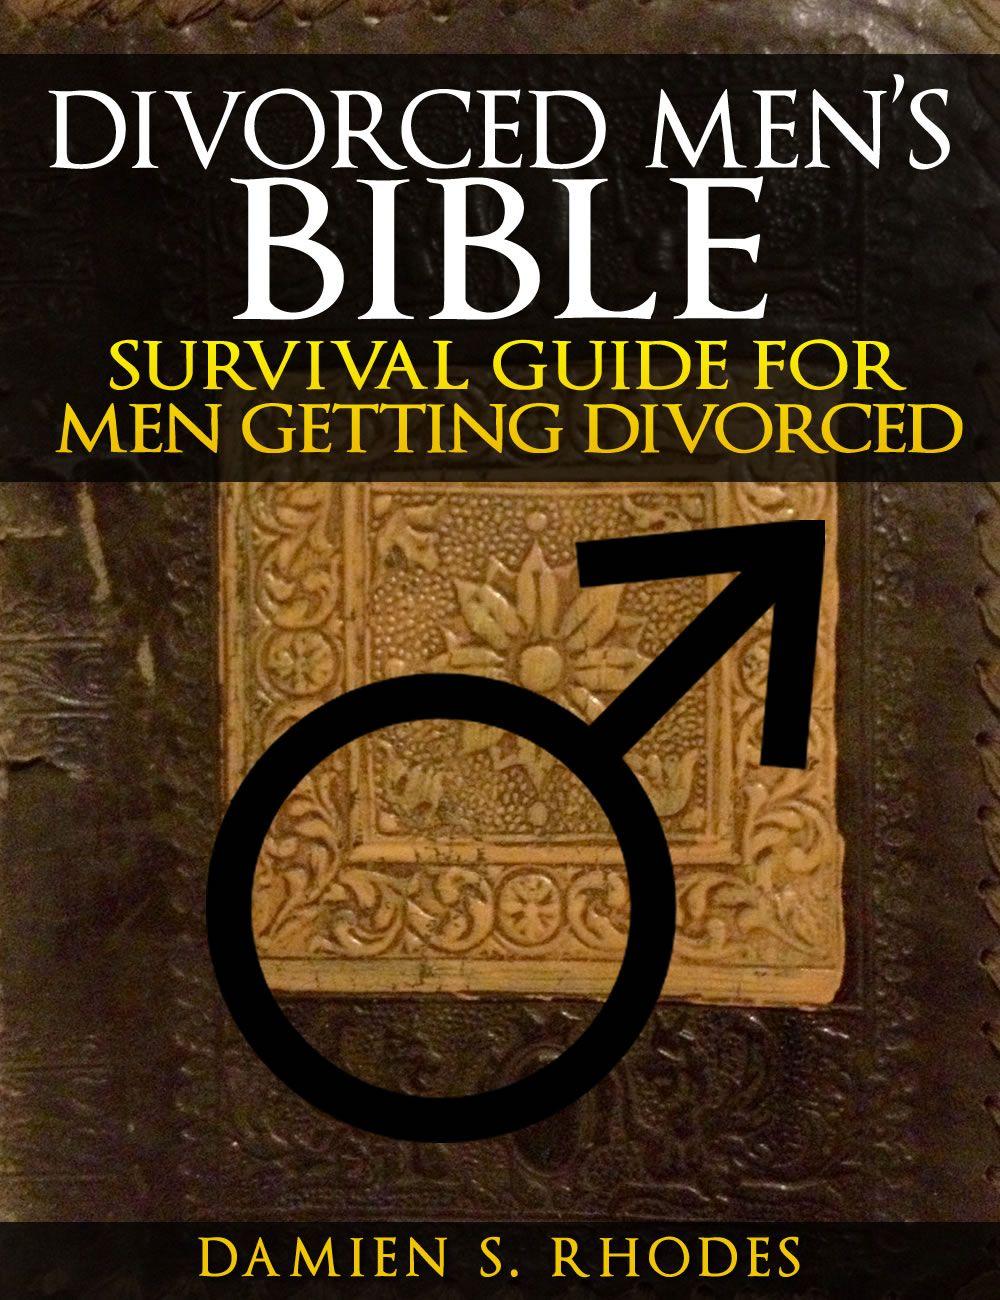 Men getting divorced